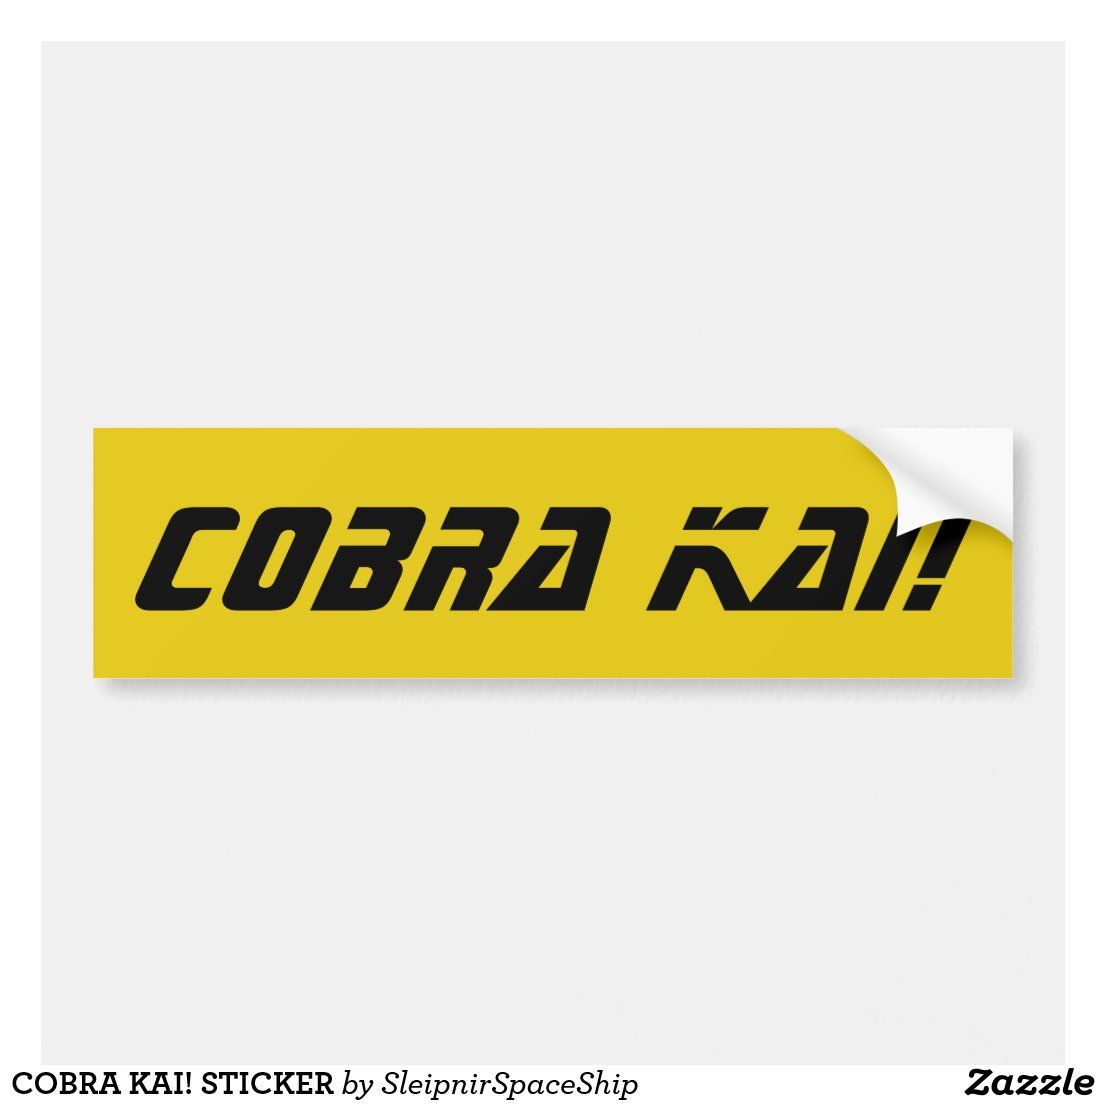 Cobra Kai Sticker Bumper Stickers Stickers Custom Holiday Card [ 1106 x 1106 Pixel ]